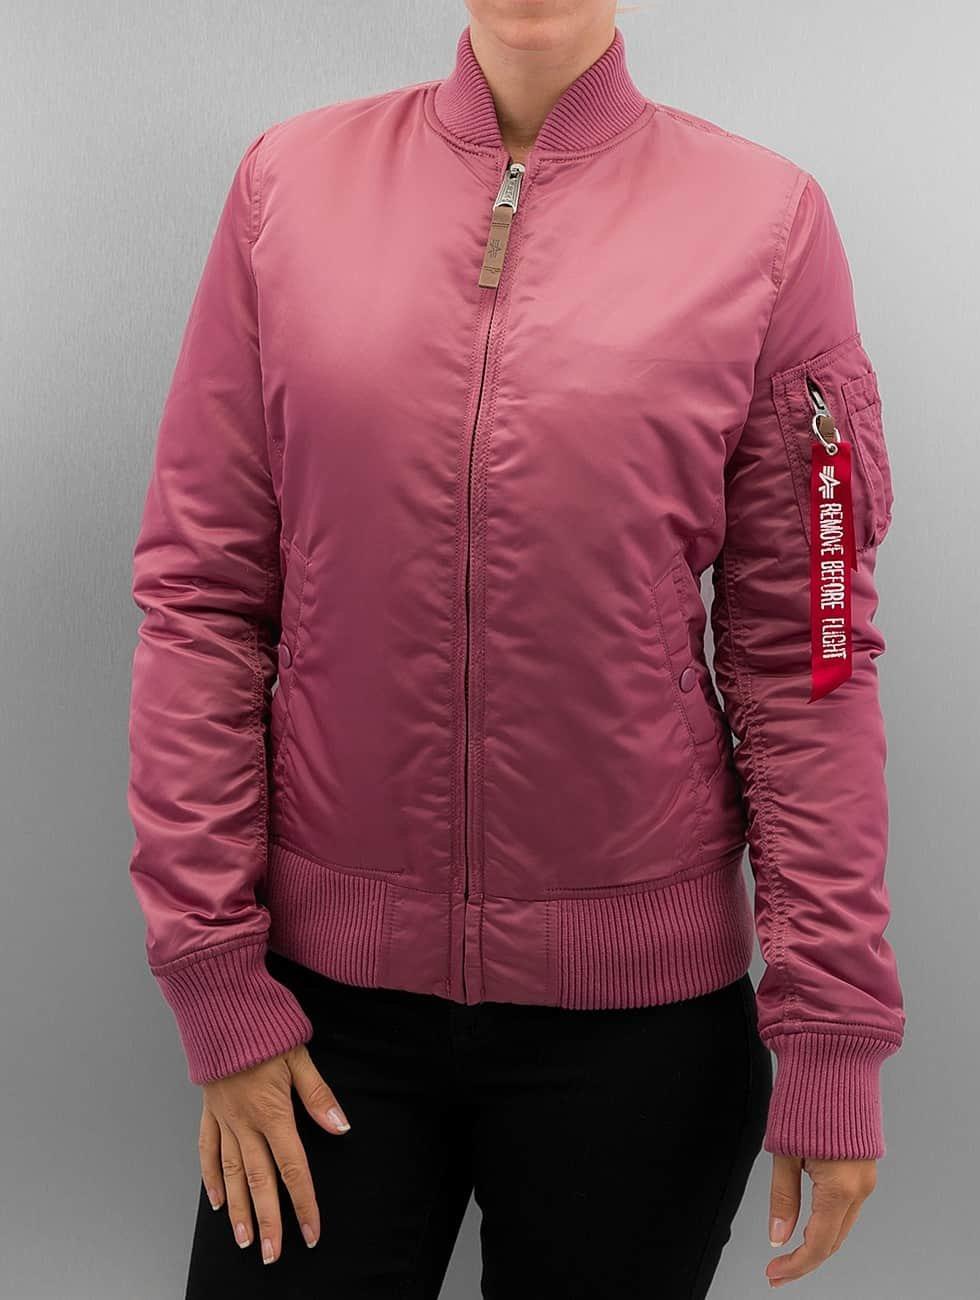 Alpha Industries Bomber jacket Ma 1 VF 59 pink